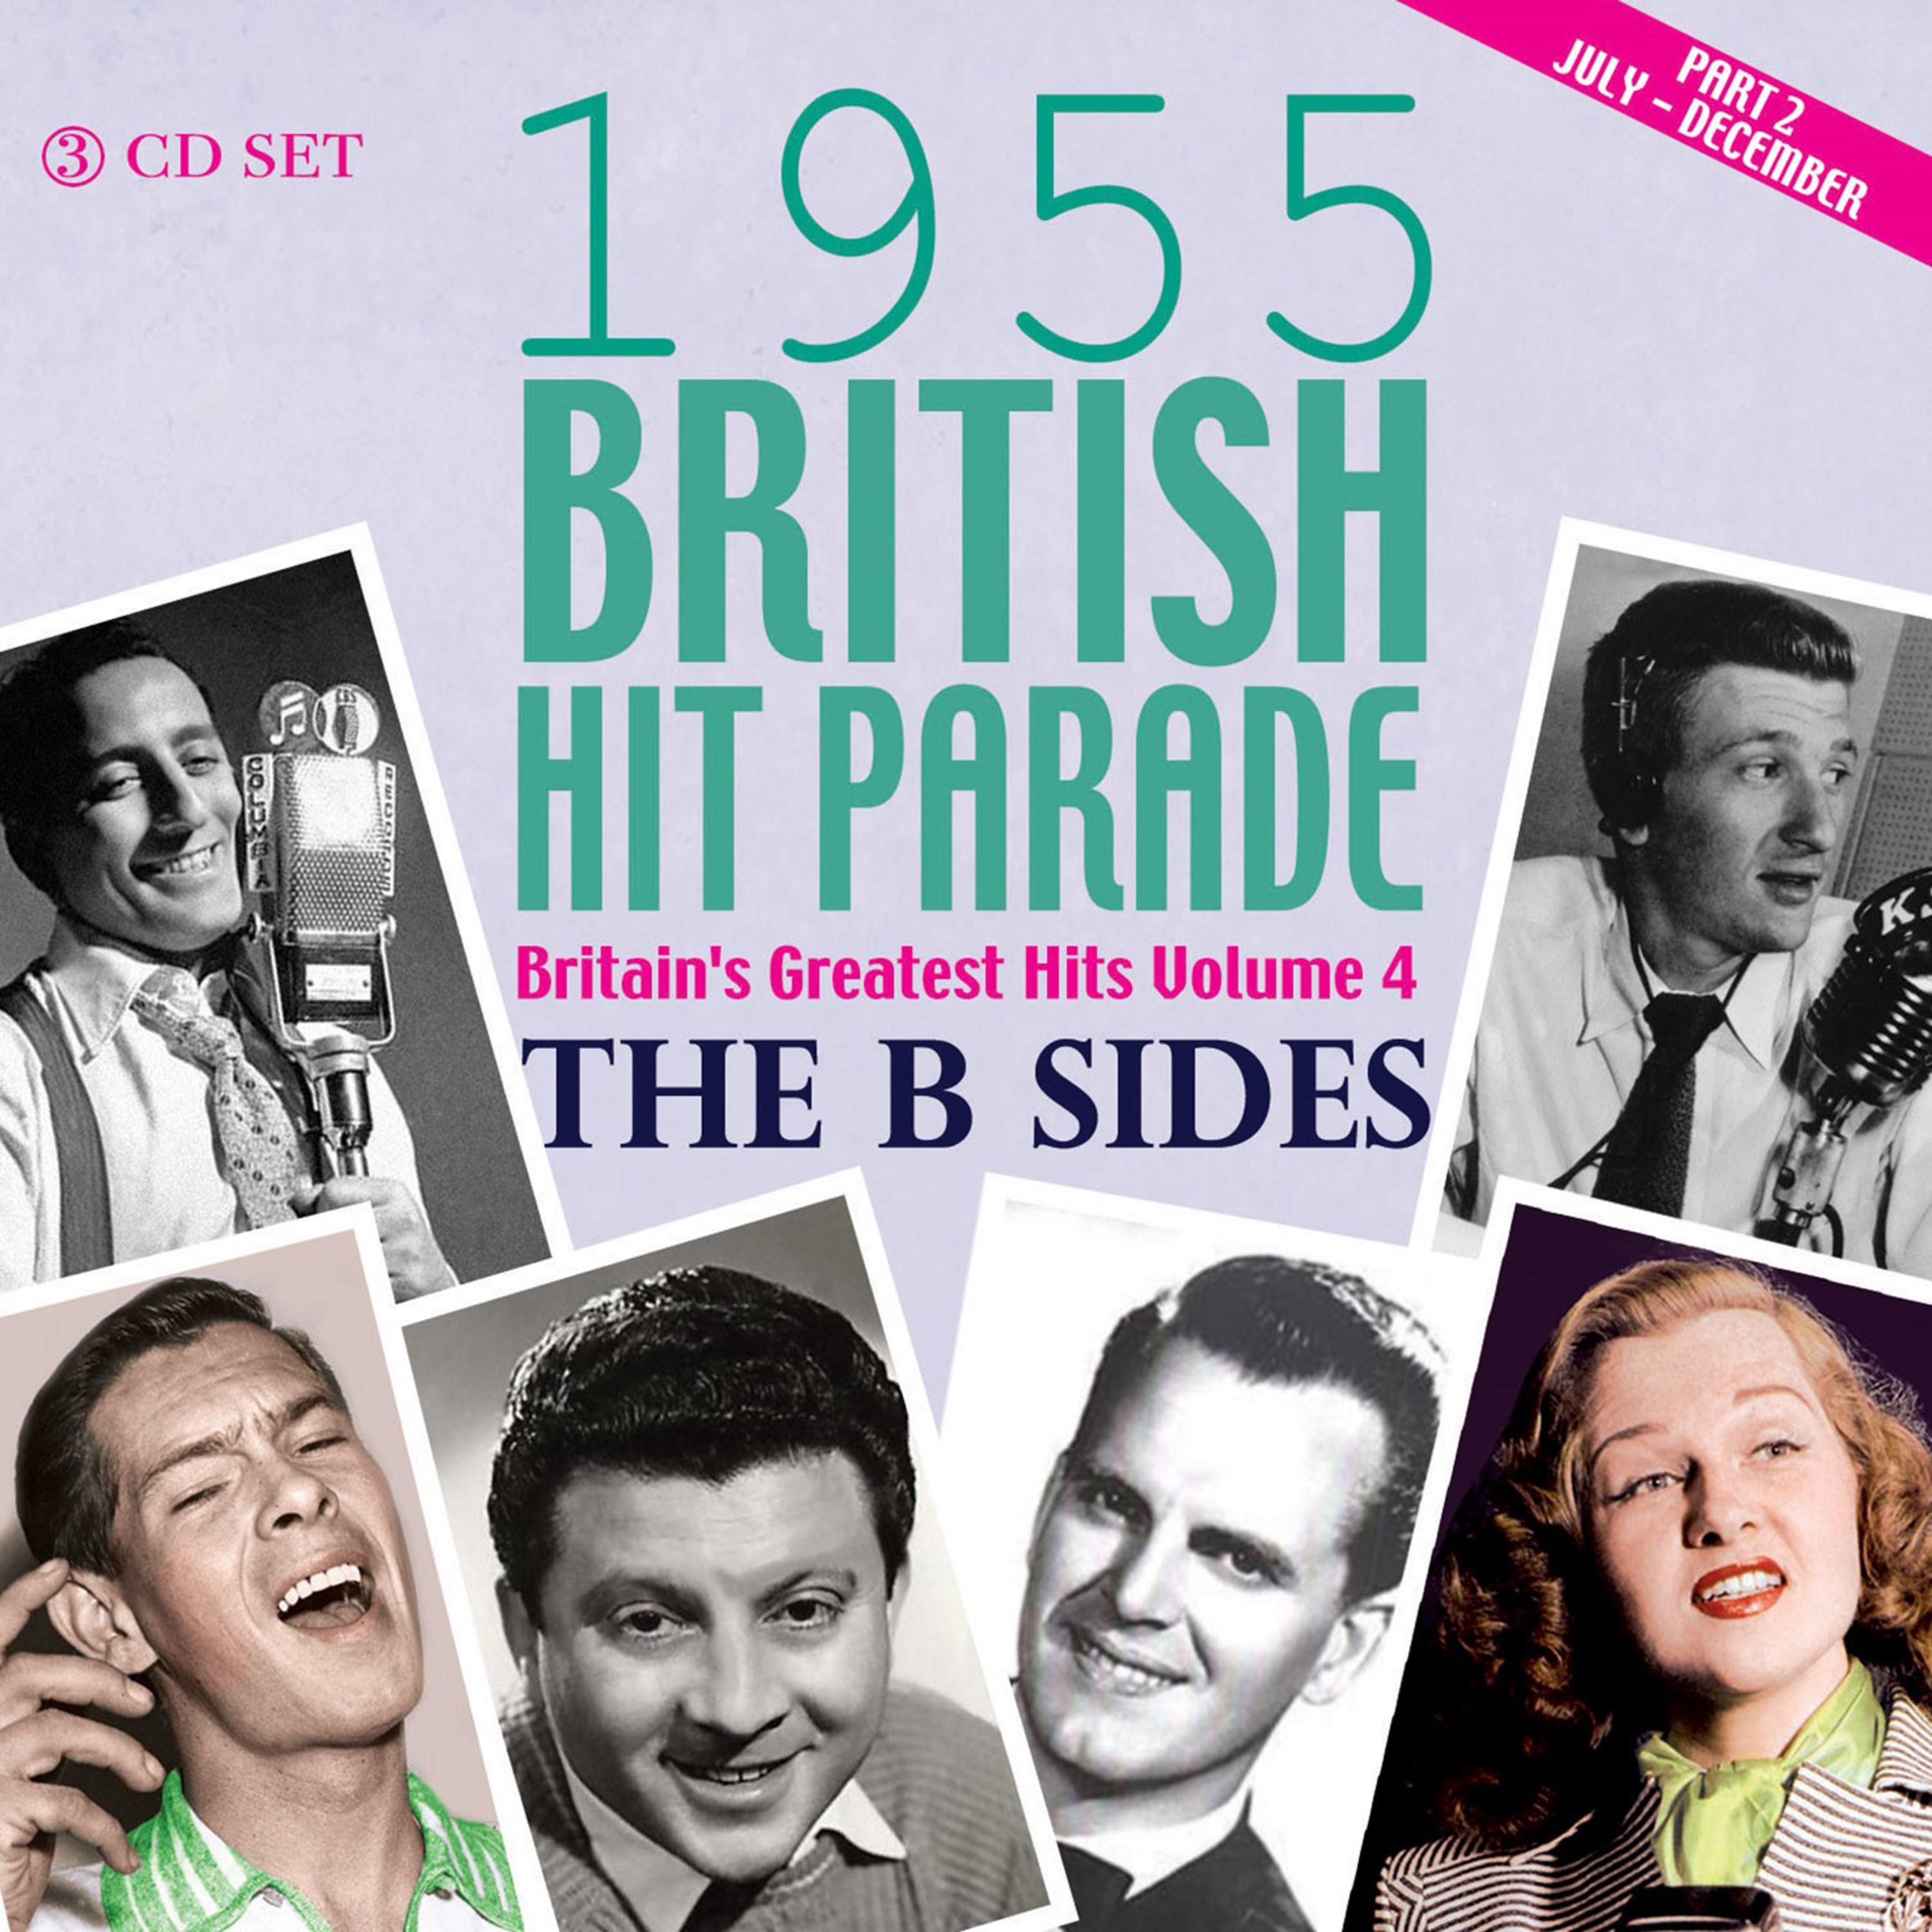 1955 British Hit Parade - The B Sides: July - December - 1